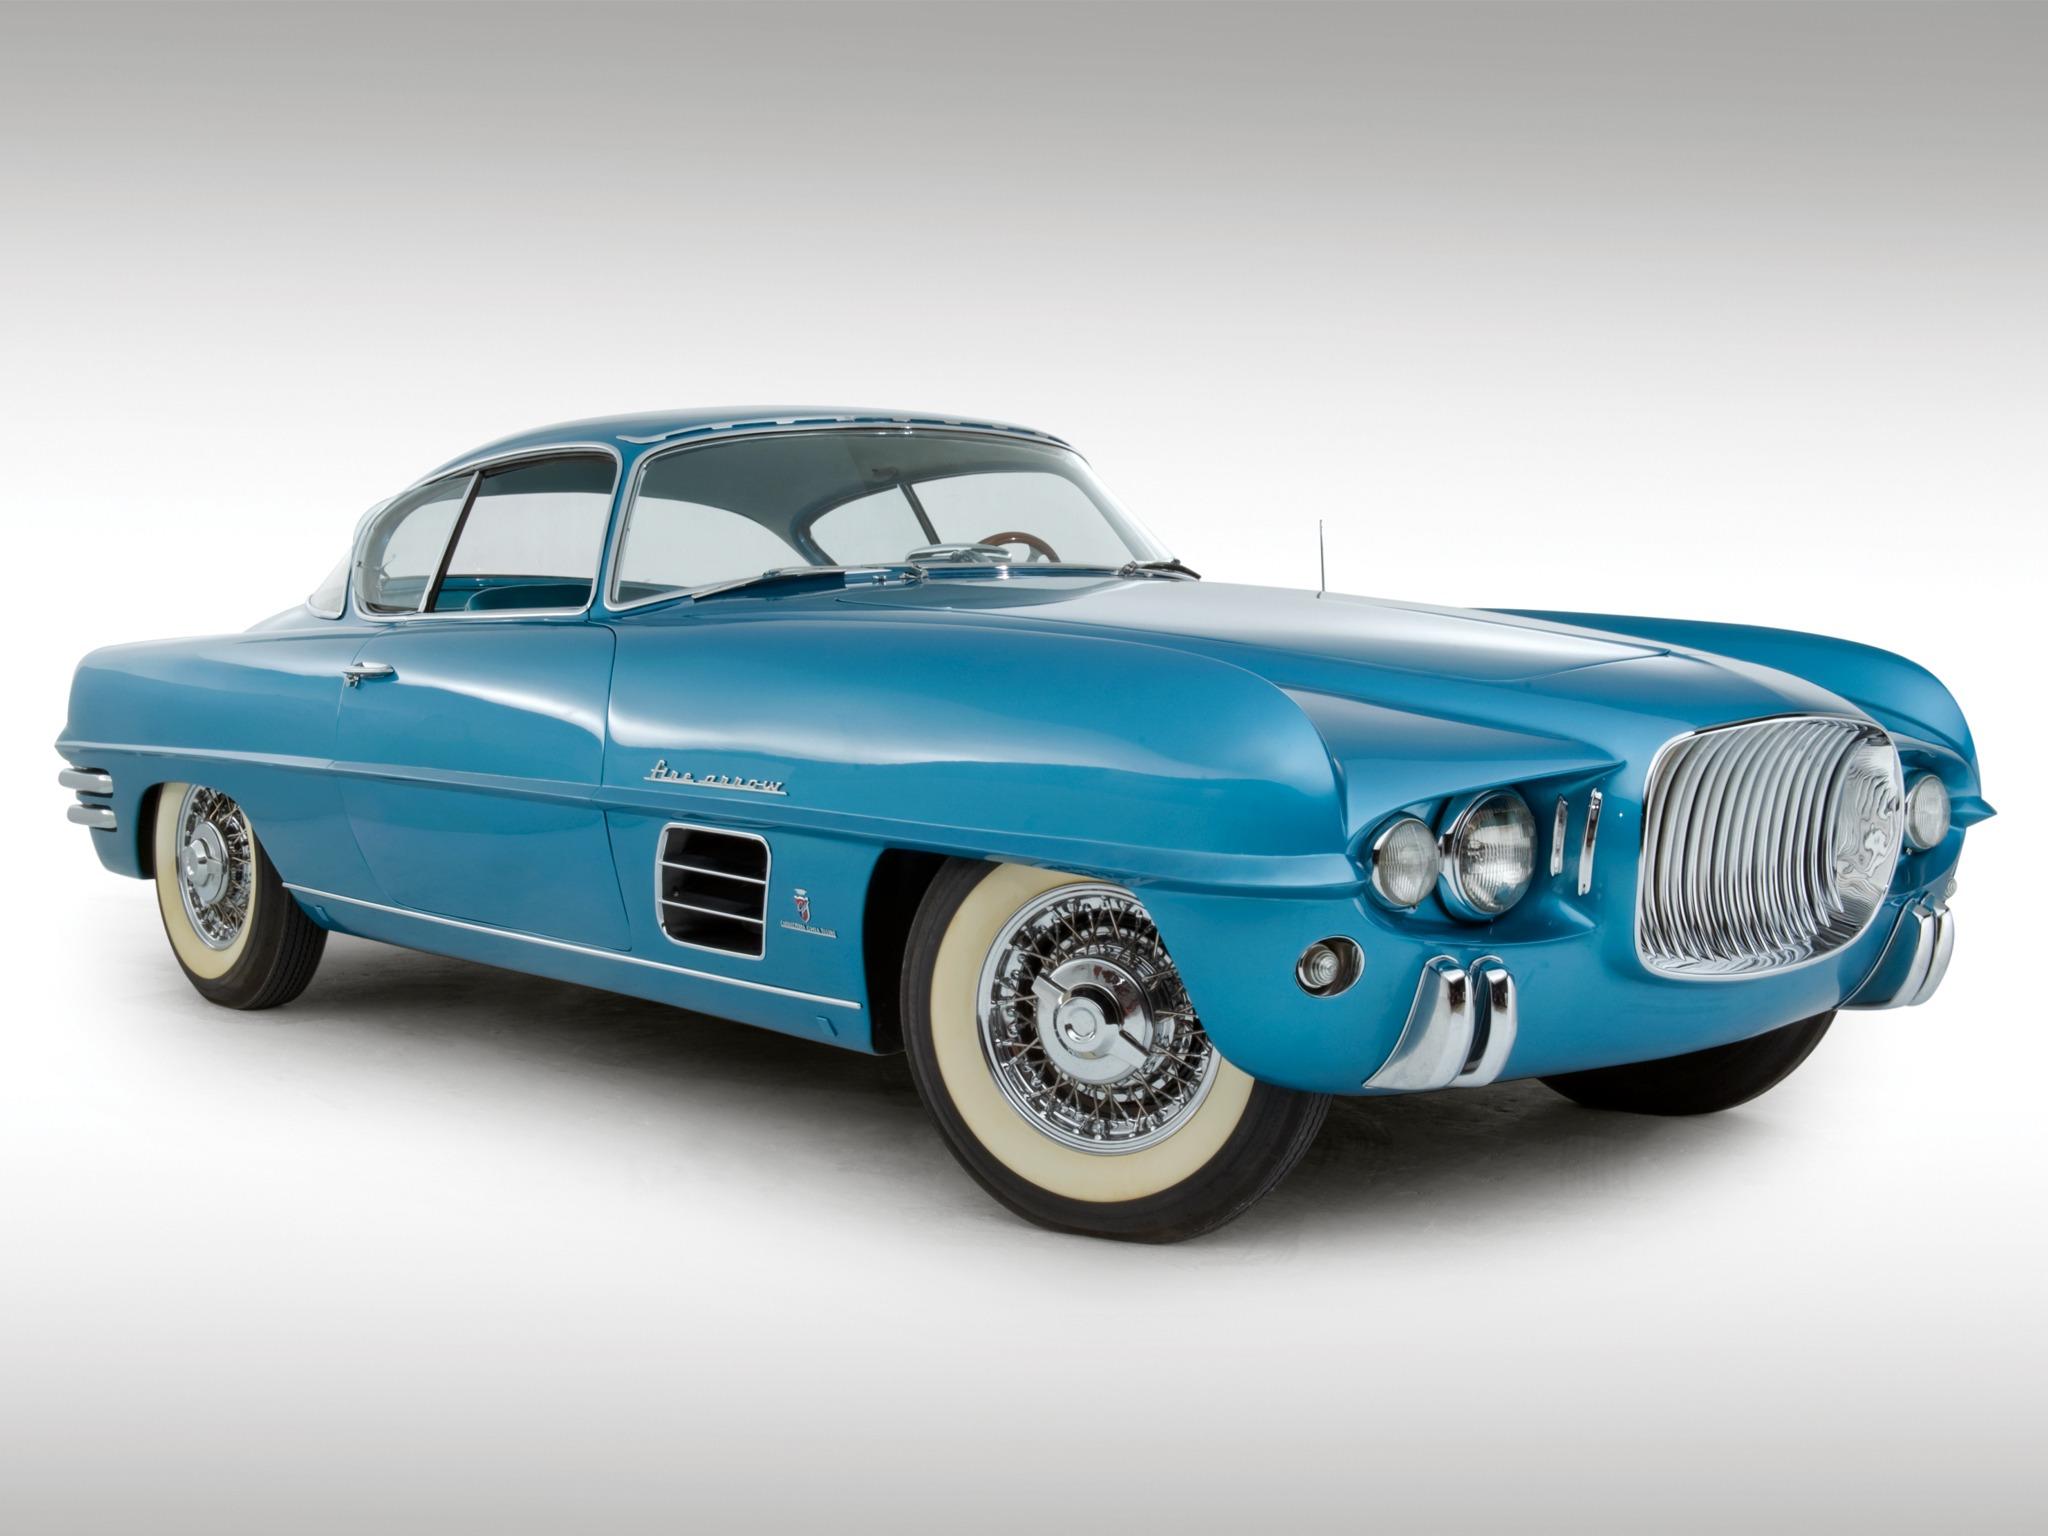 dodge firearrow iii sport coupe concept car 1954 old concept cars. Black Bedroom Furniture Sets. Home Design Ideas